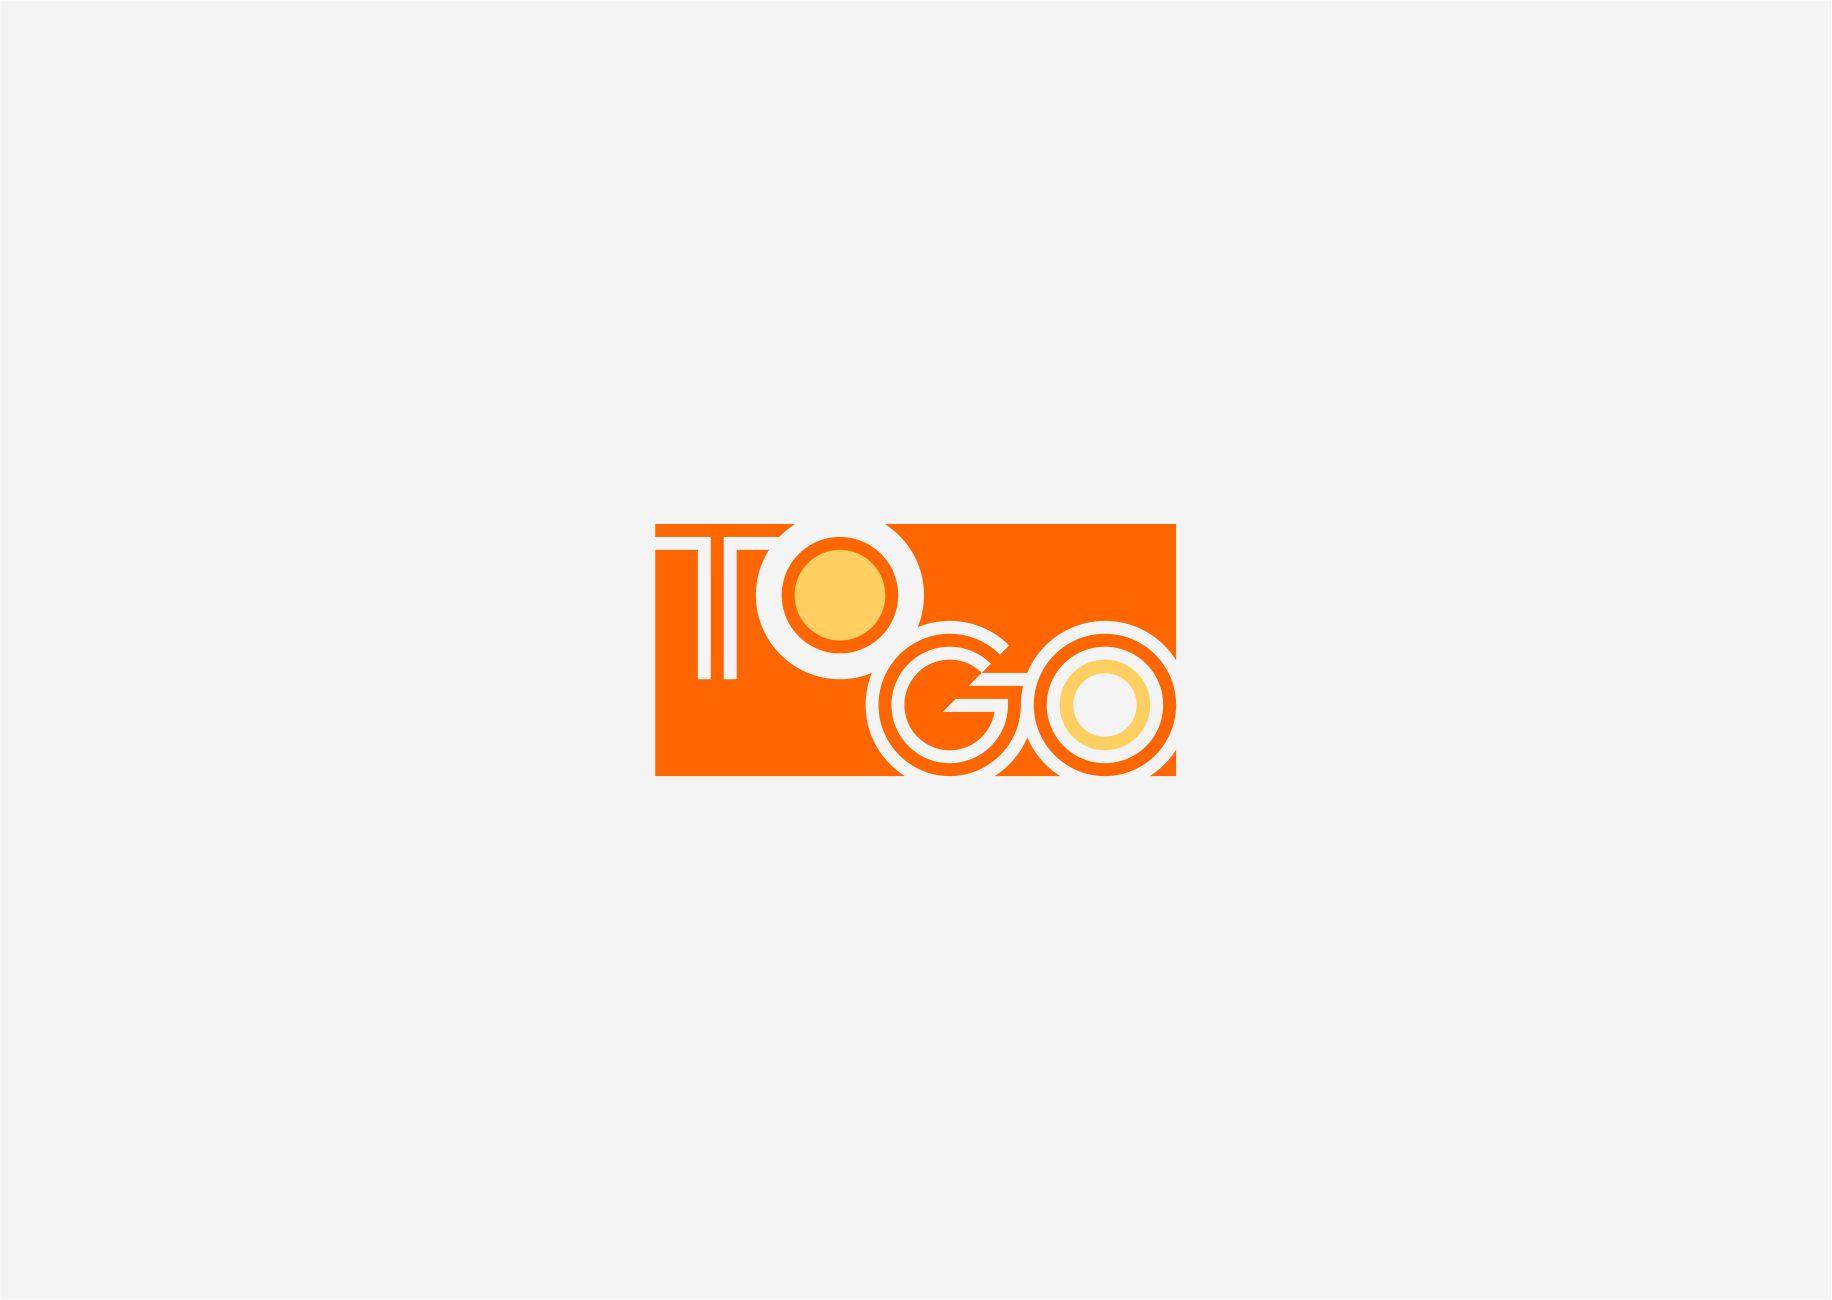 Разработать логотип и экран загрузки приложения фото f_4025a8018c8a29ff.jpg